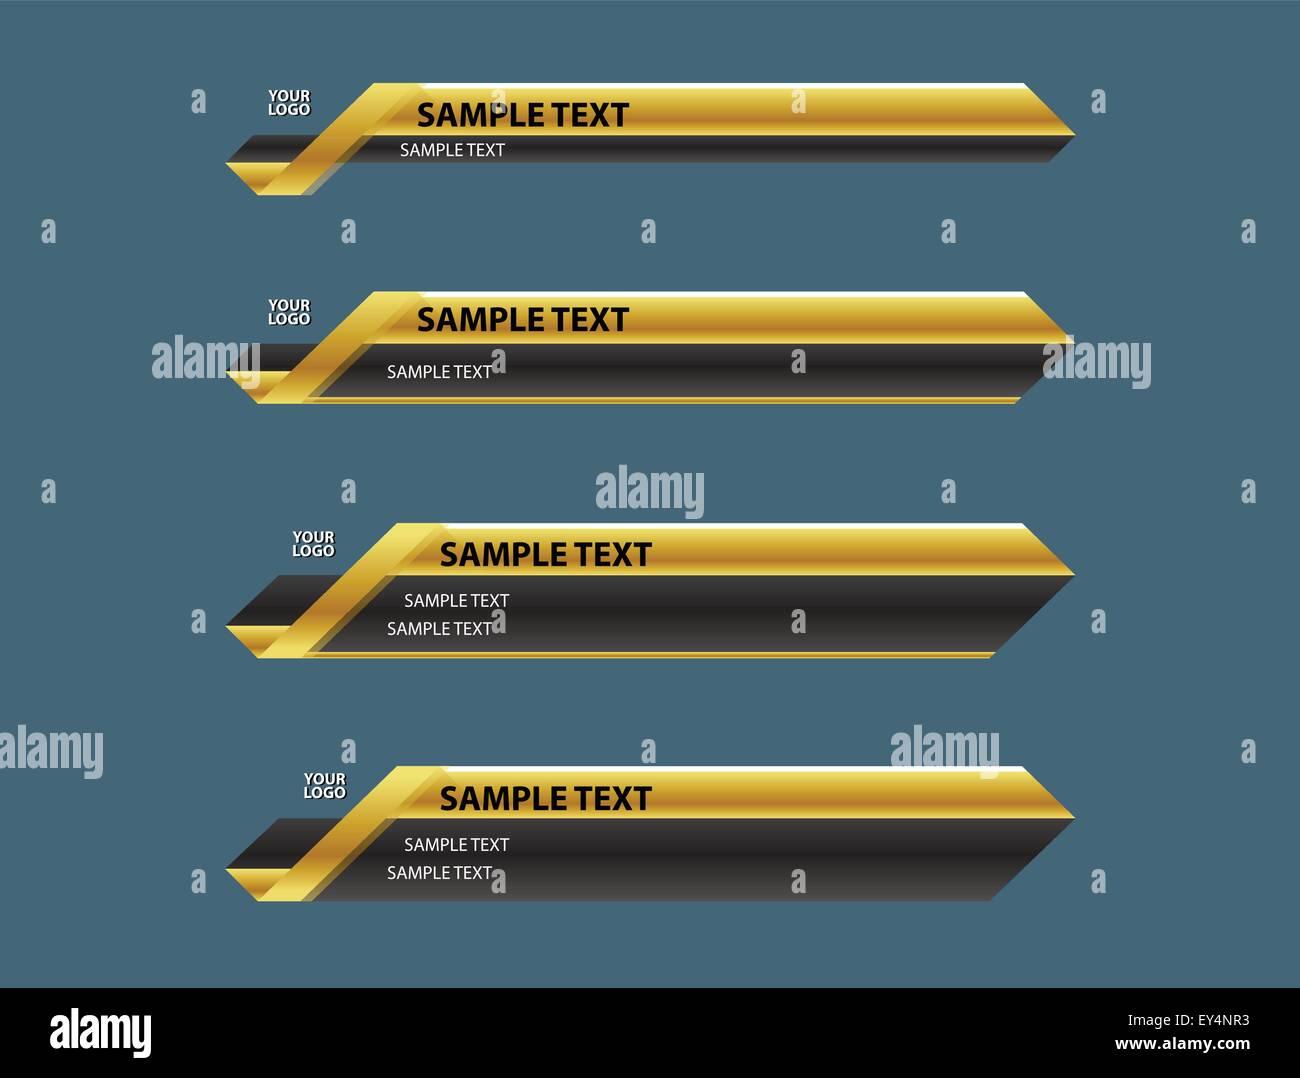 lower third banner bar name screen tv stock vector art